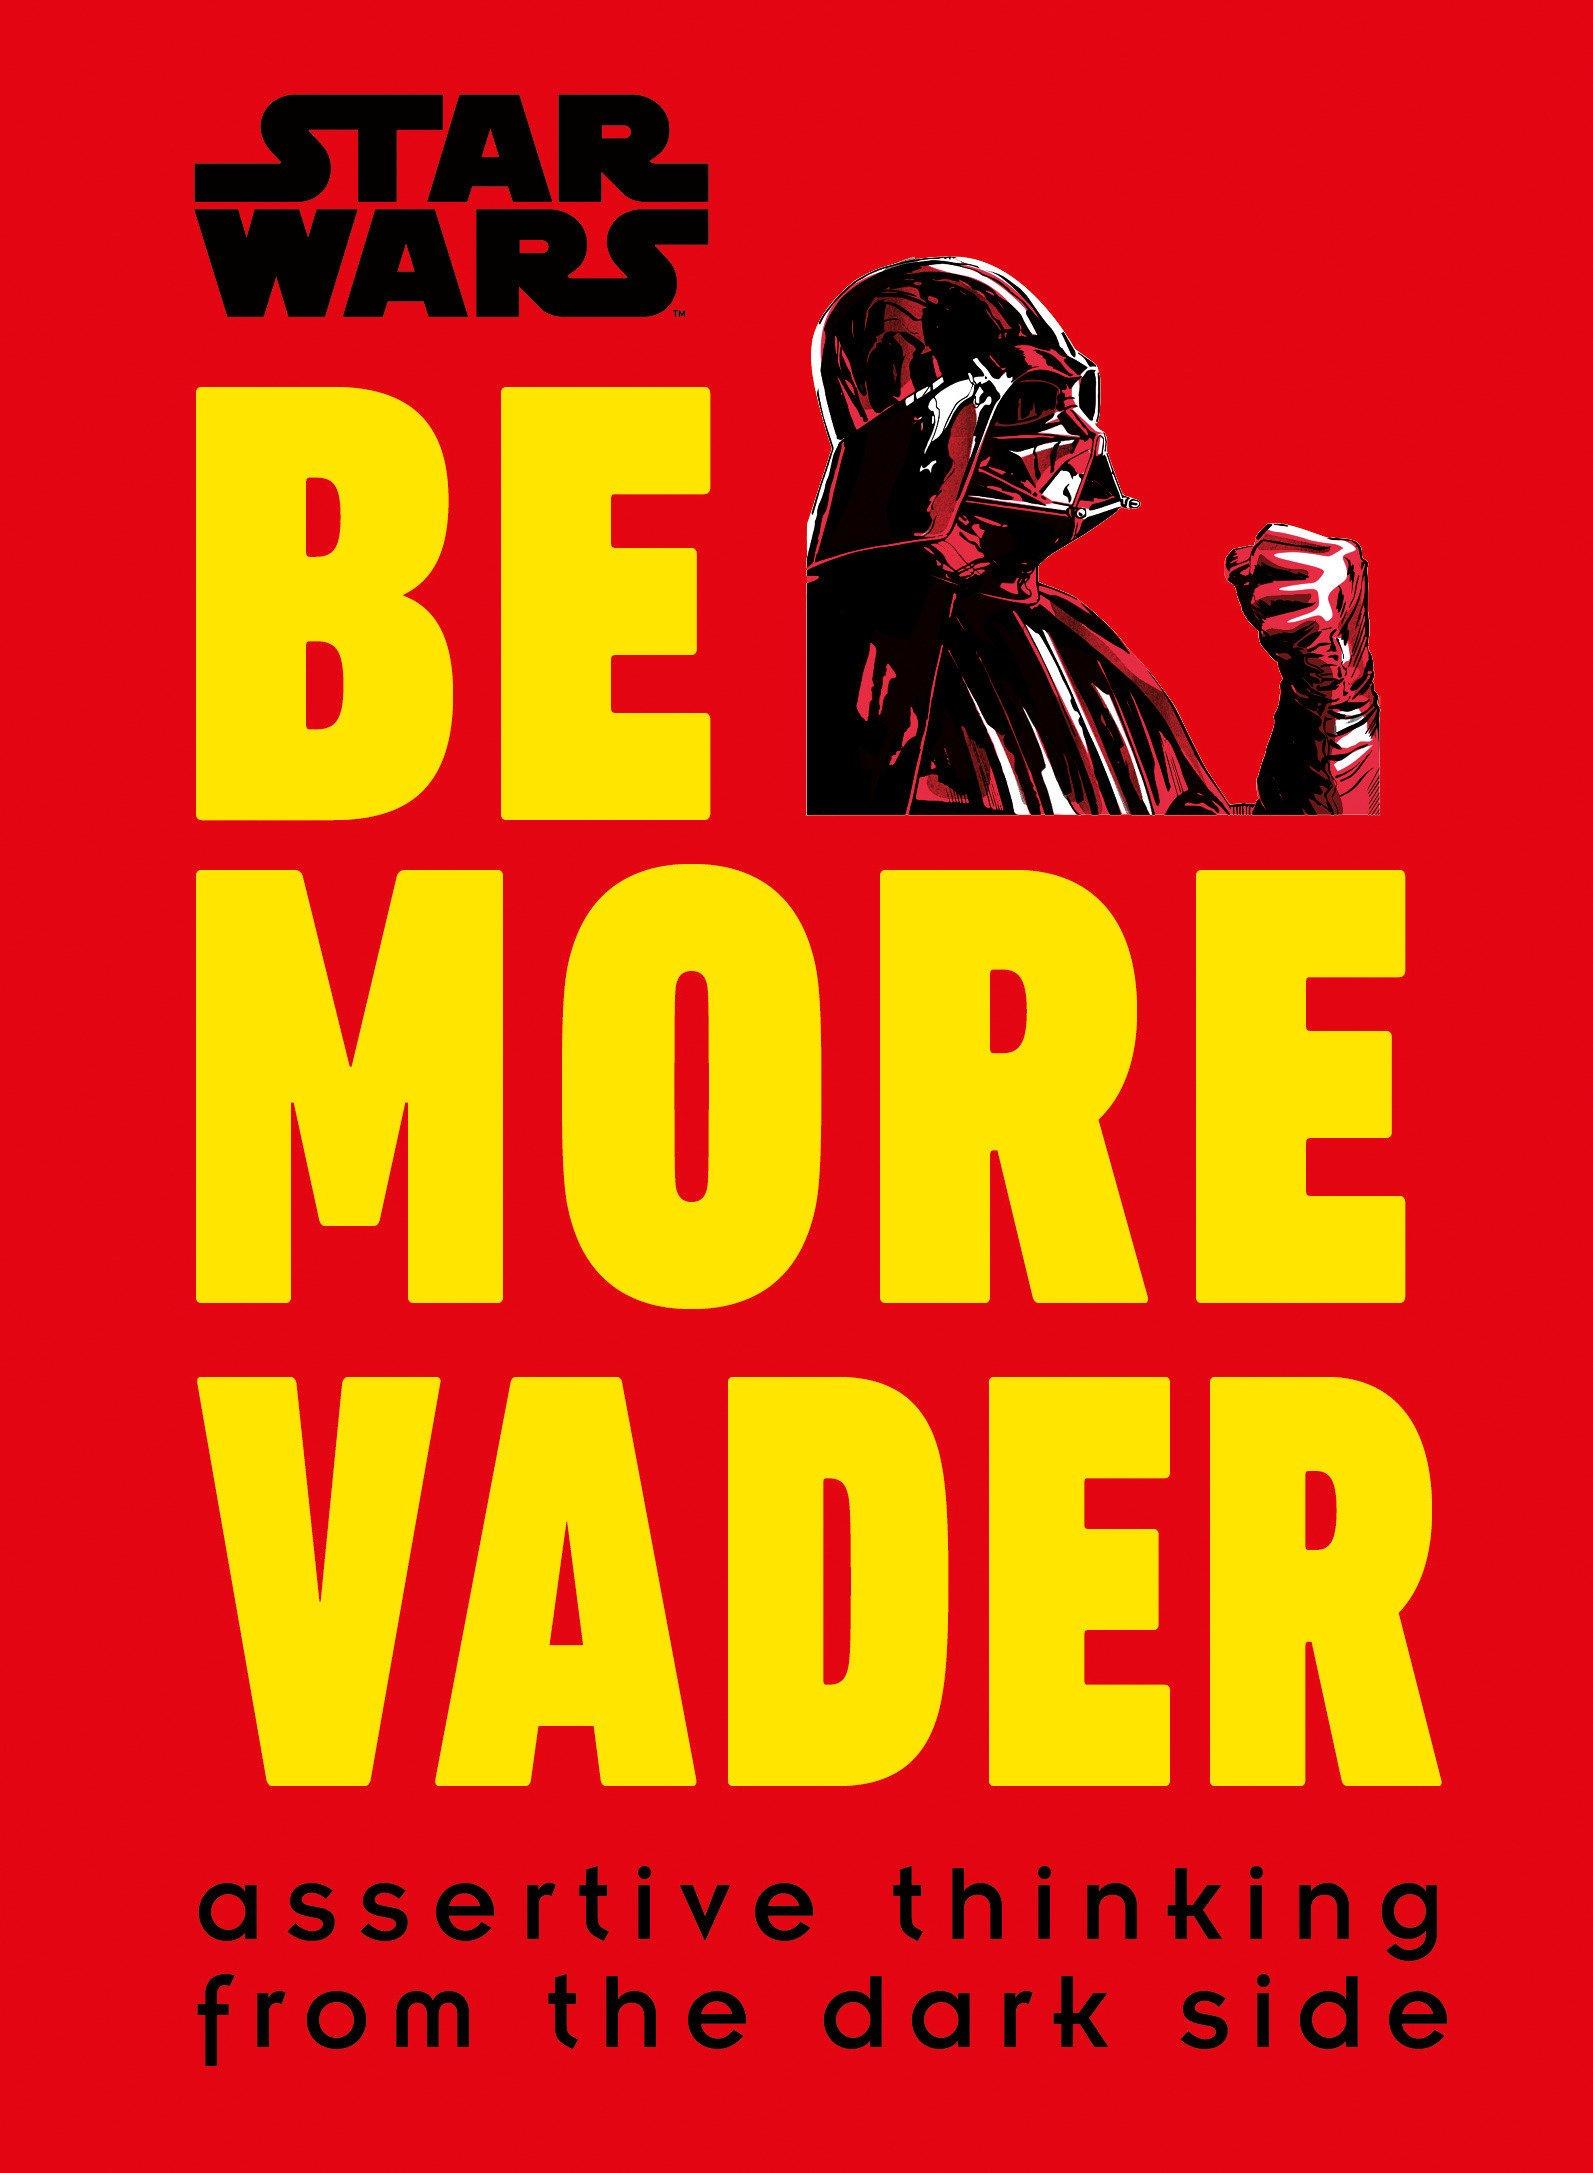 Star Wars: Be More Vader